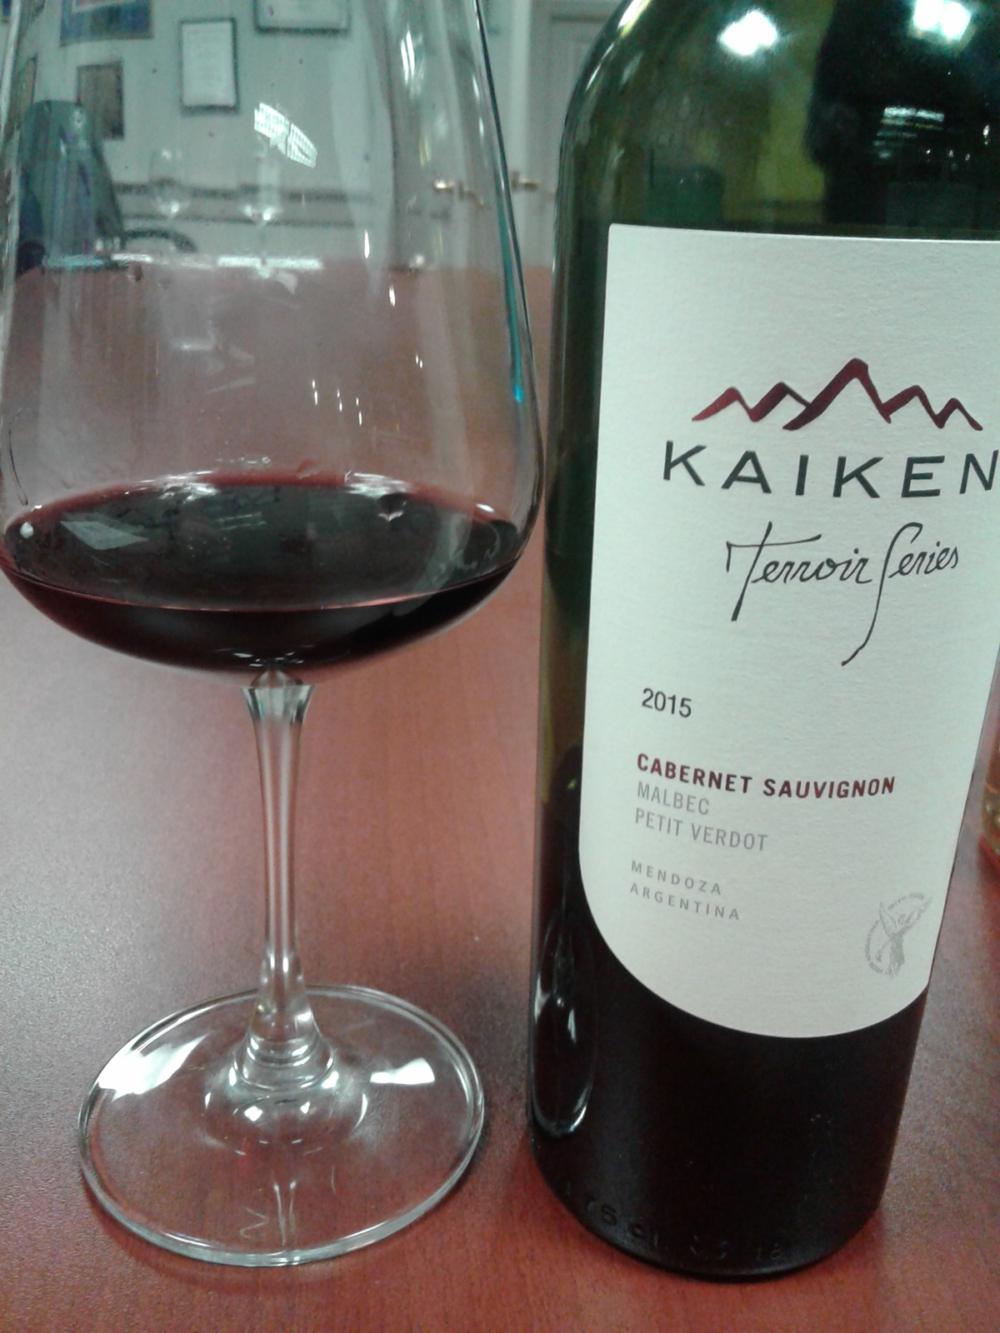 Kaiken Terroir Series Cabernet Sauvignon, Argentina